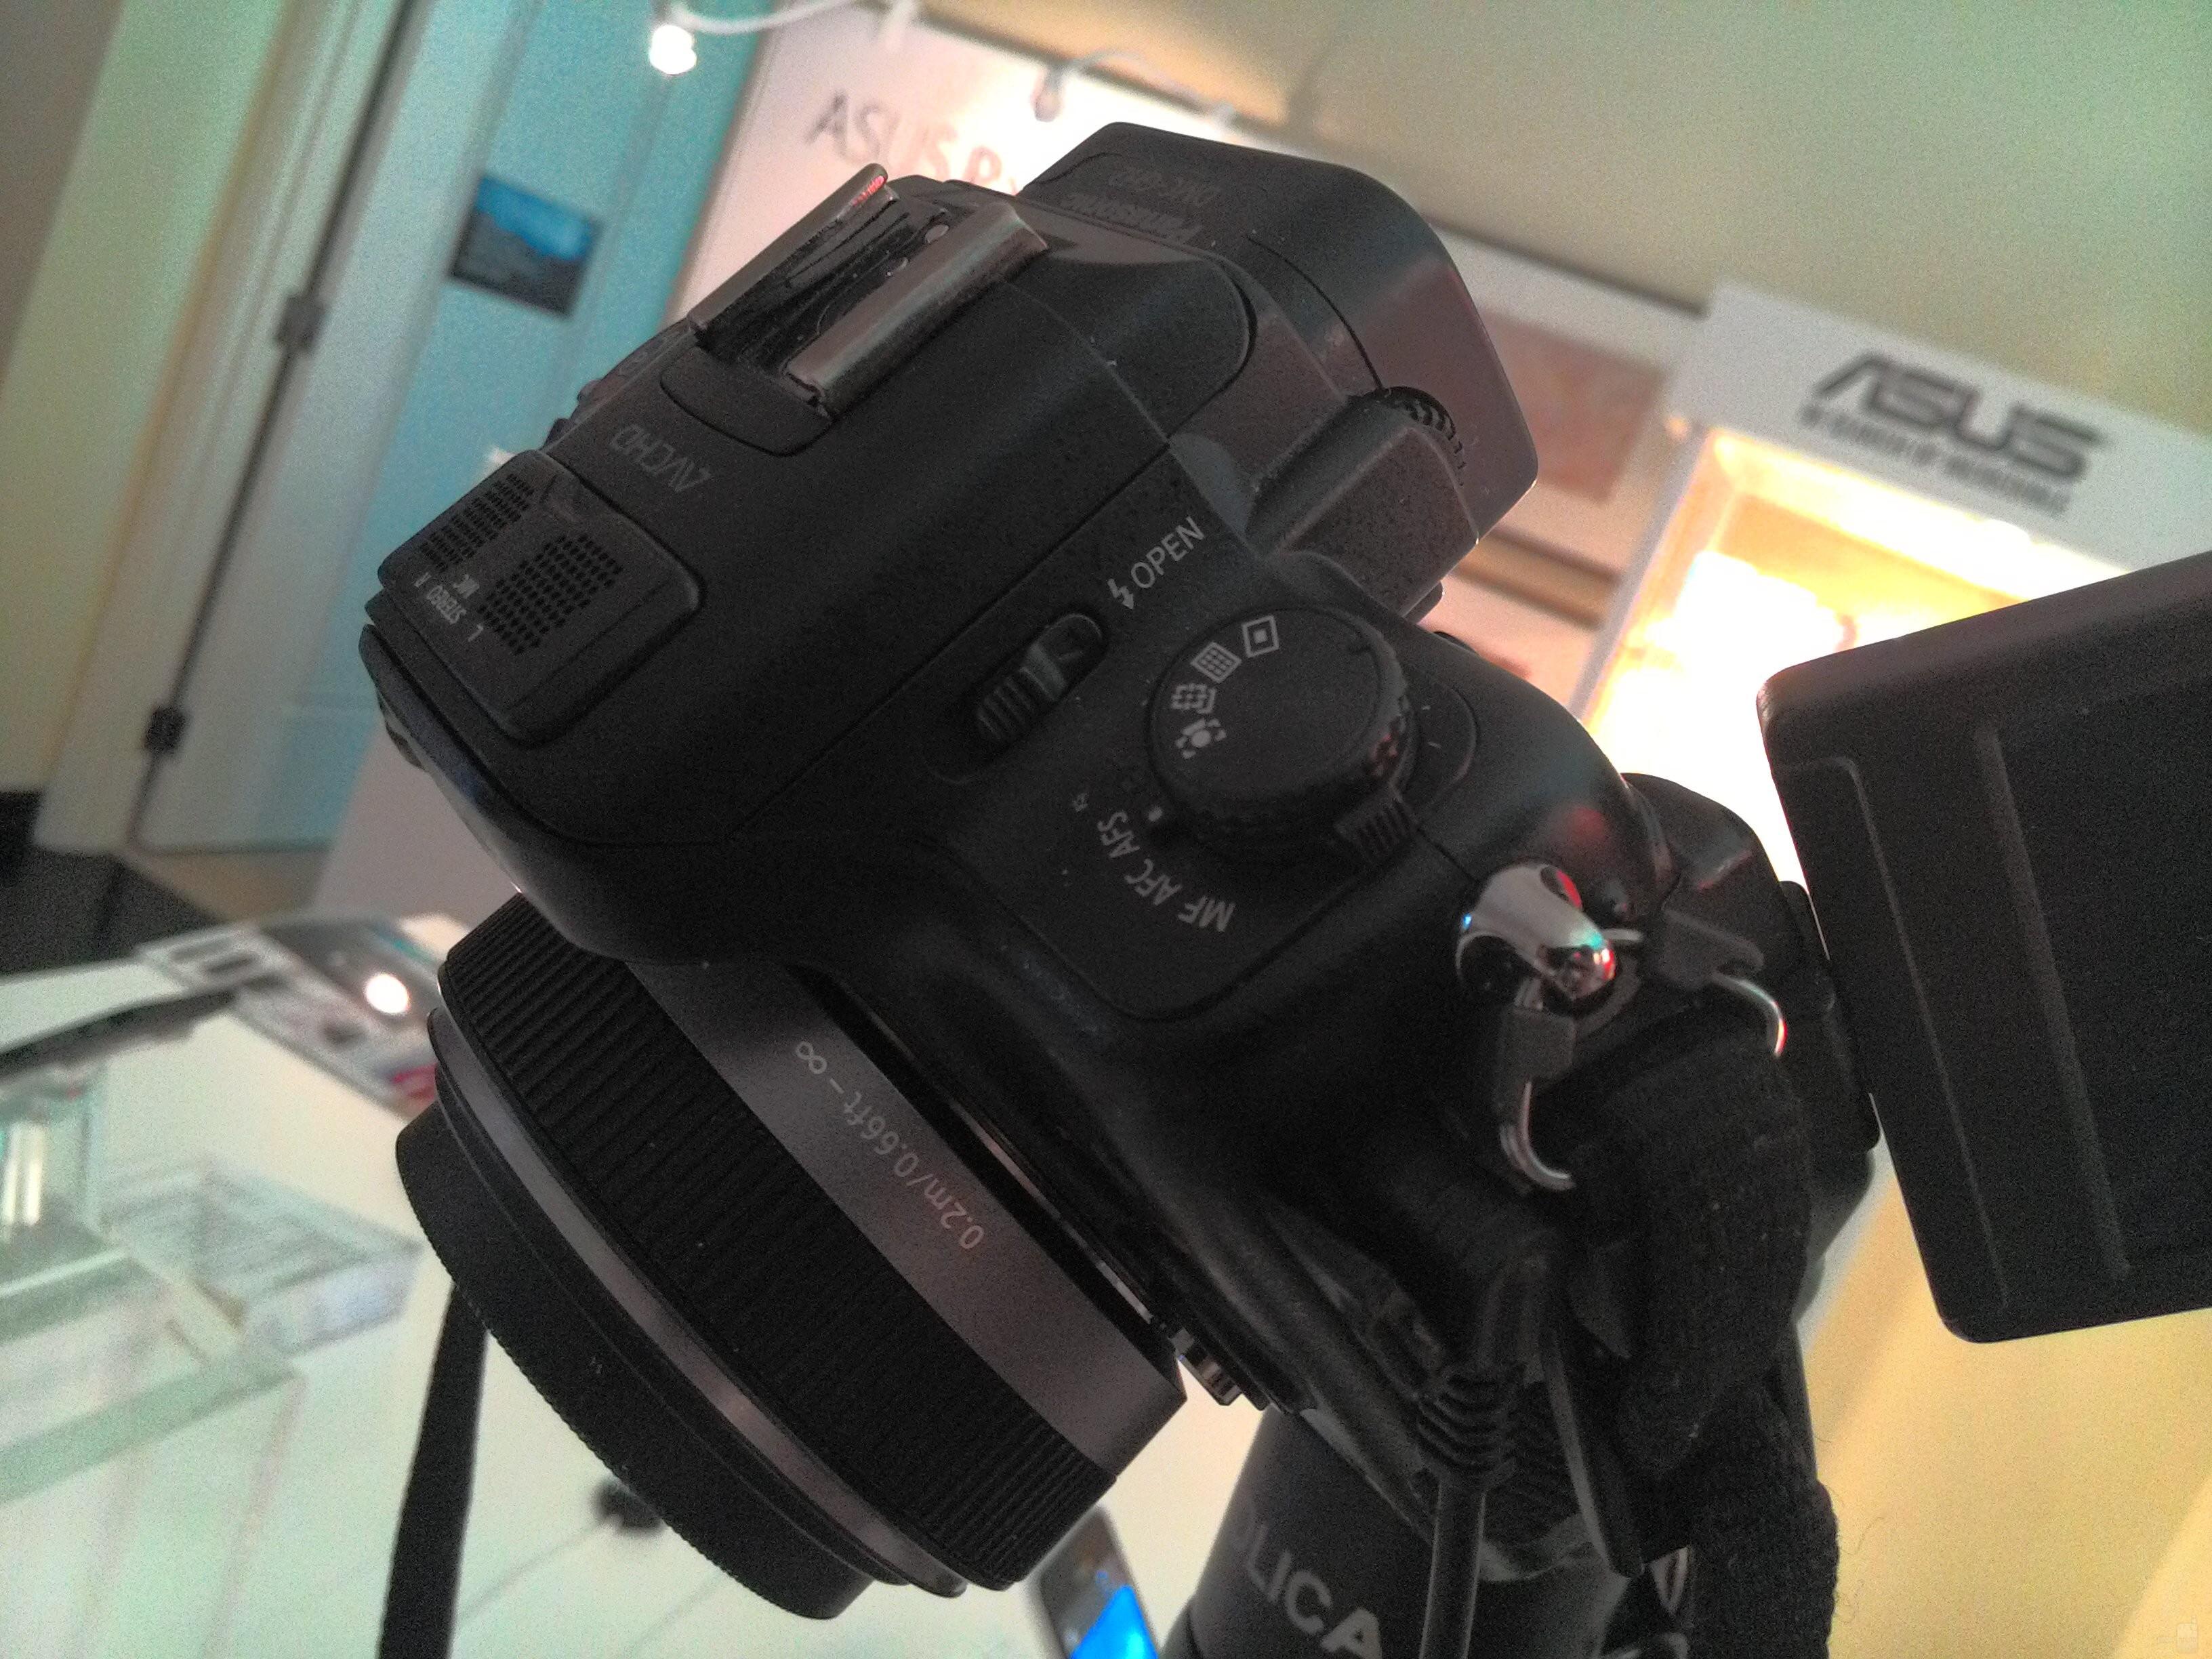 Asus Webcam Driver